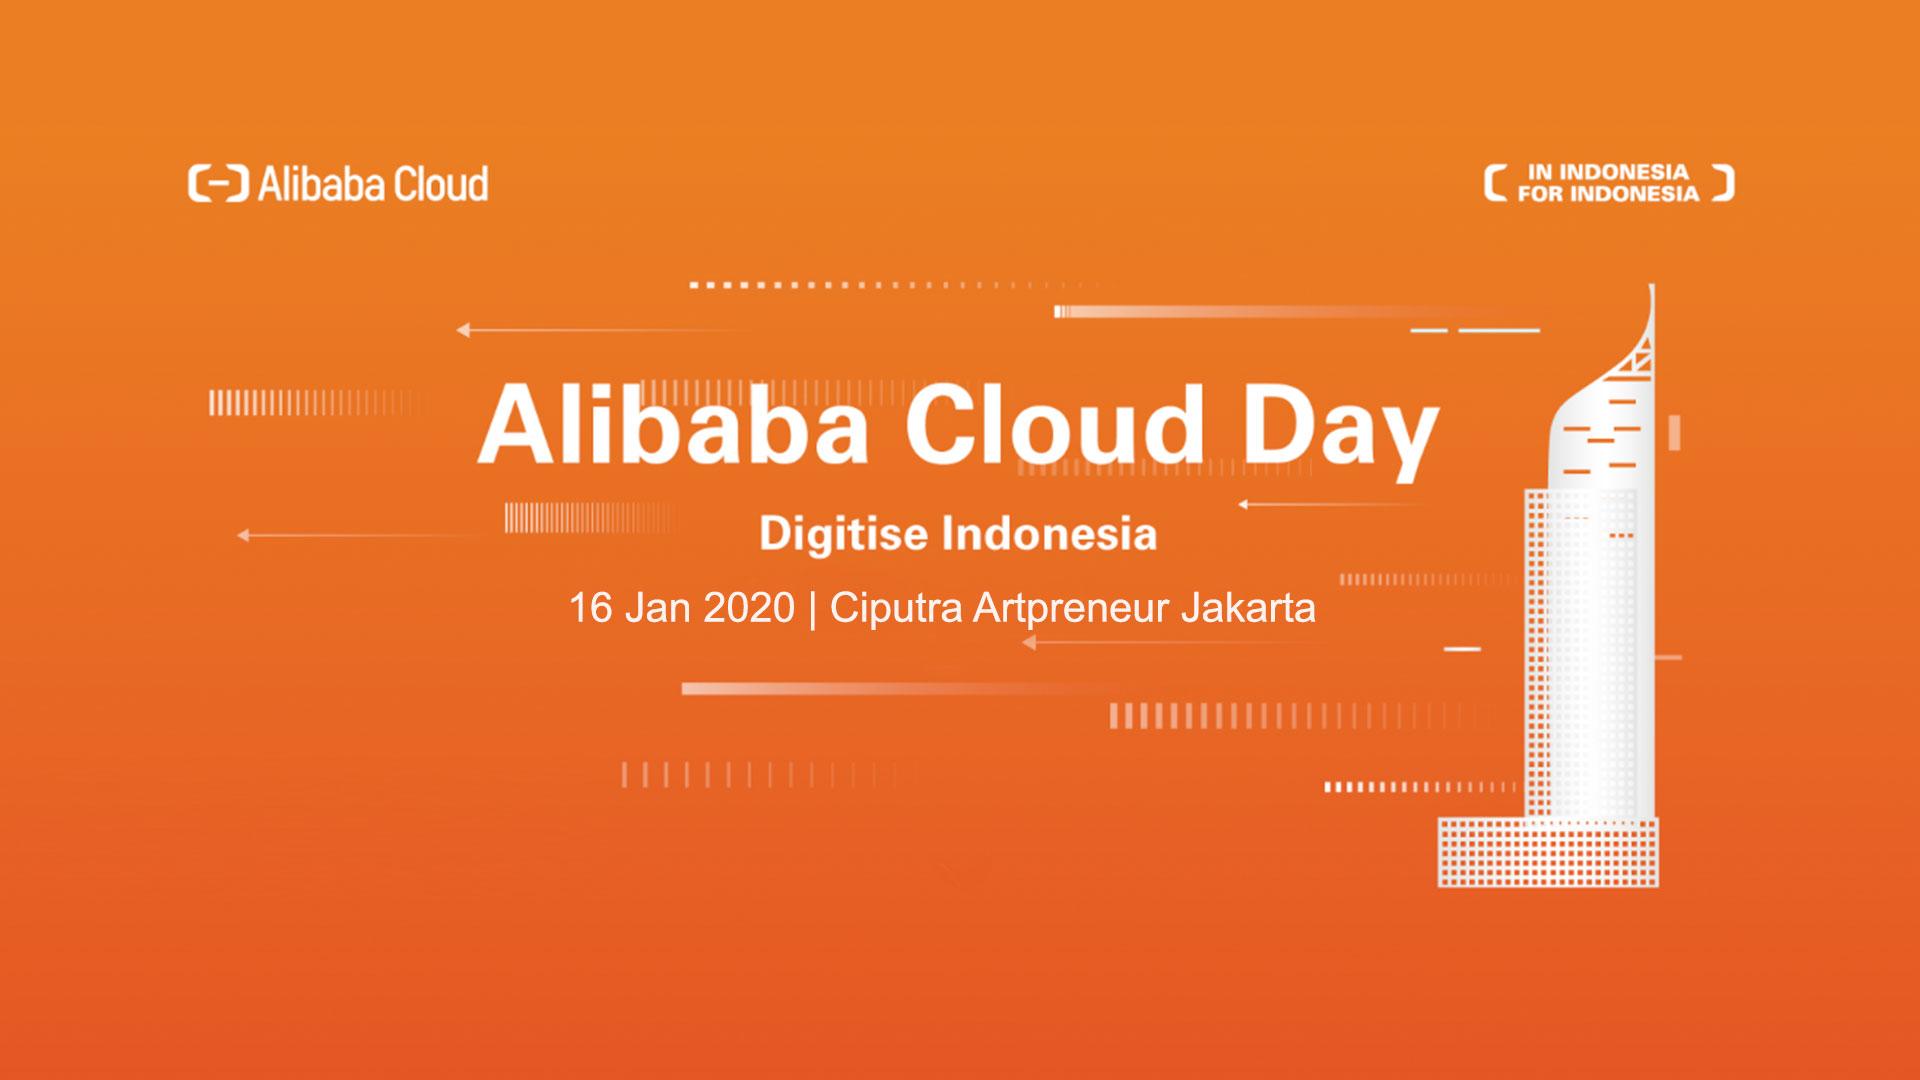 Alibaba Cloud Day